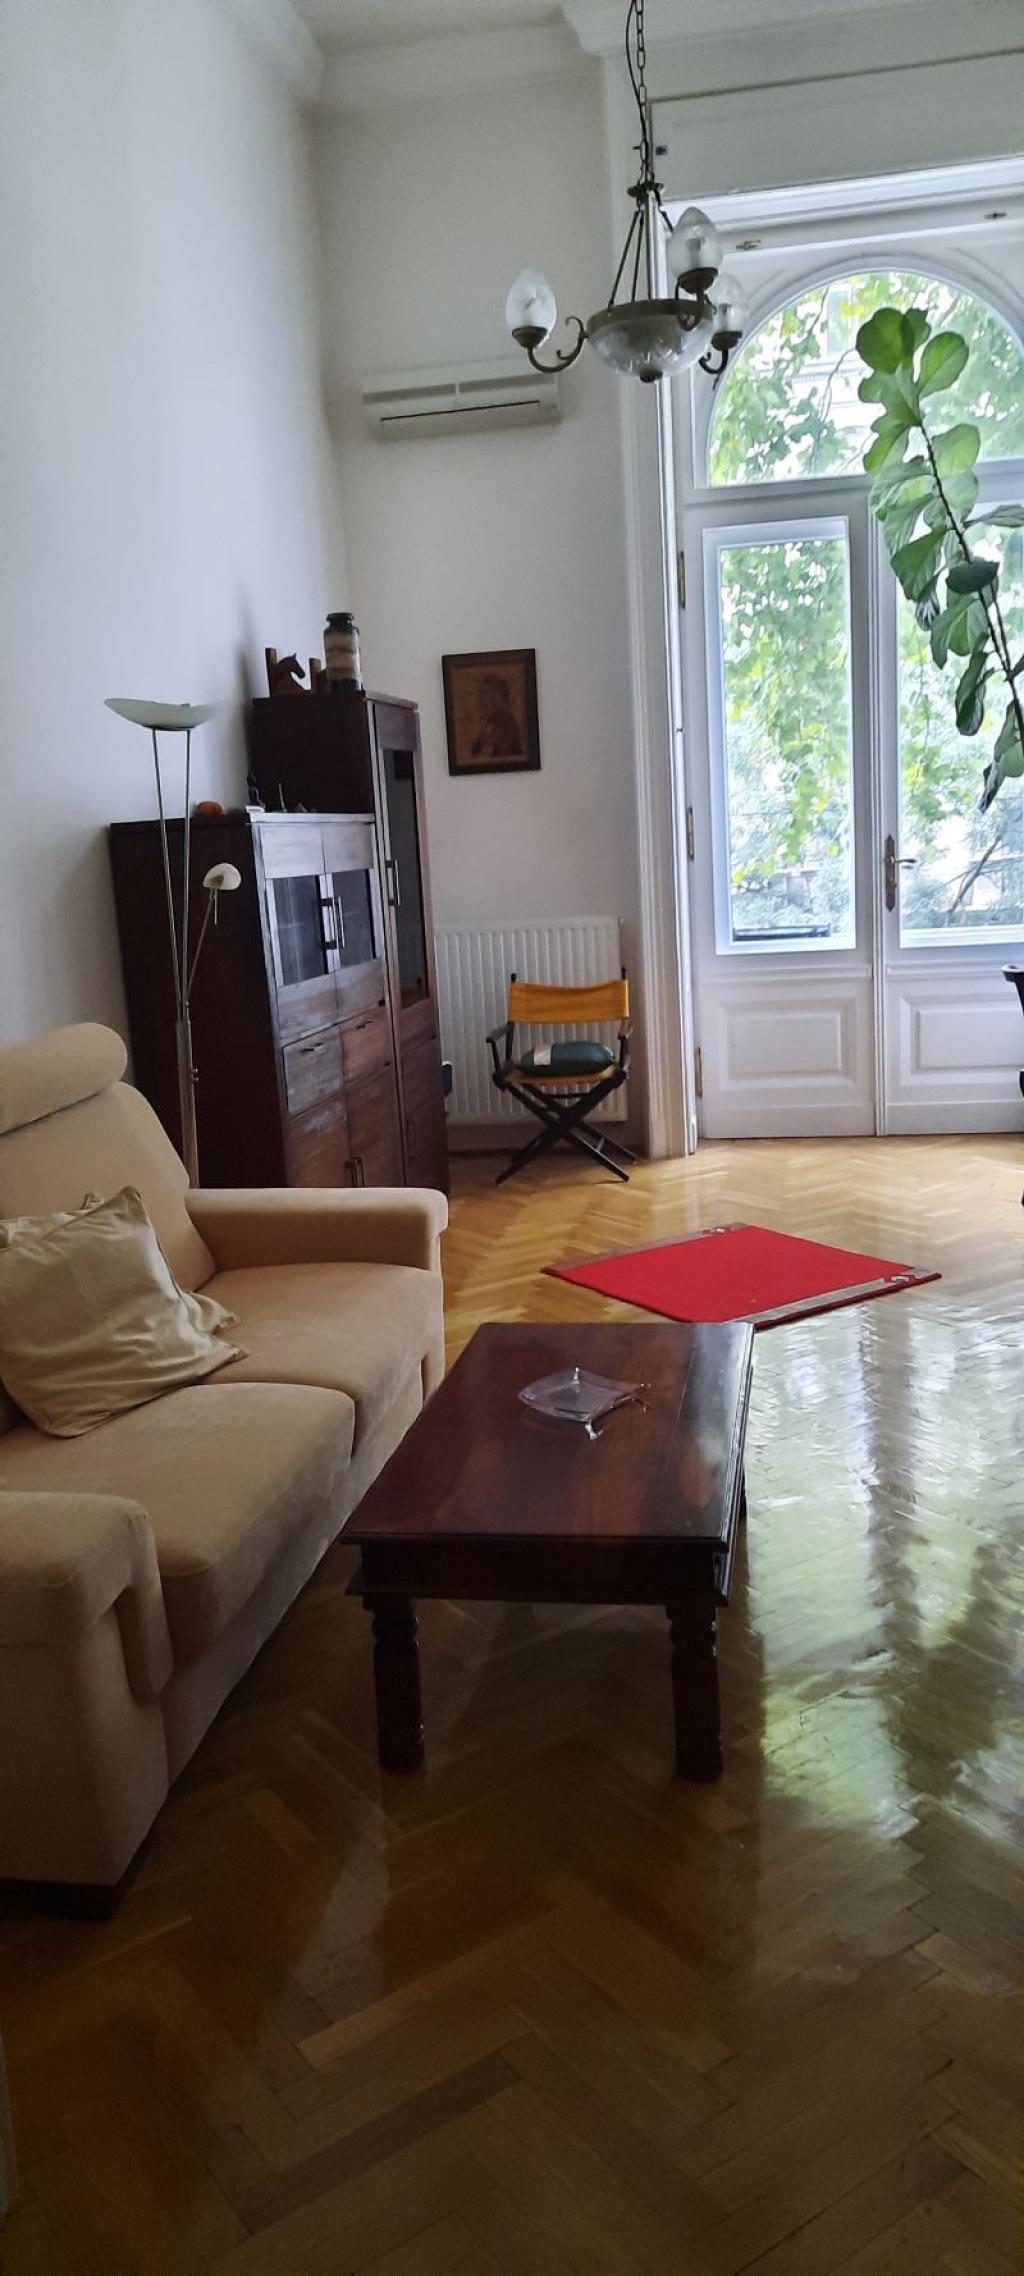 flat For rent 1065 Budapest Podmaniczky utca 75sqm 1500 €/month Property image: 1